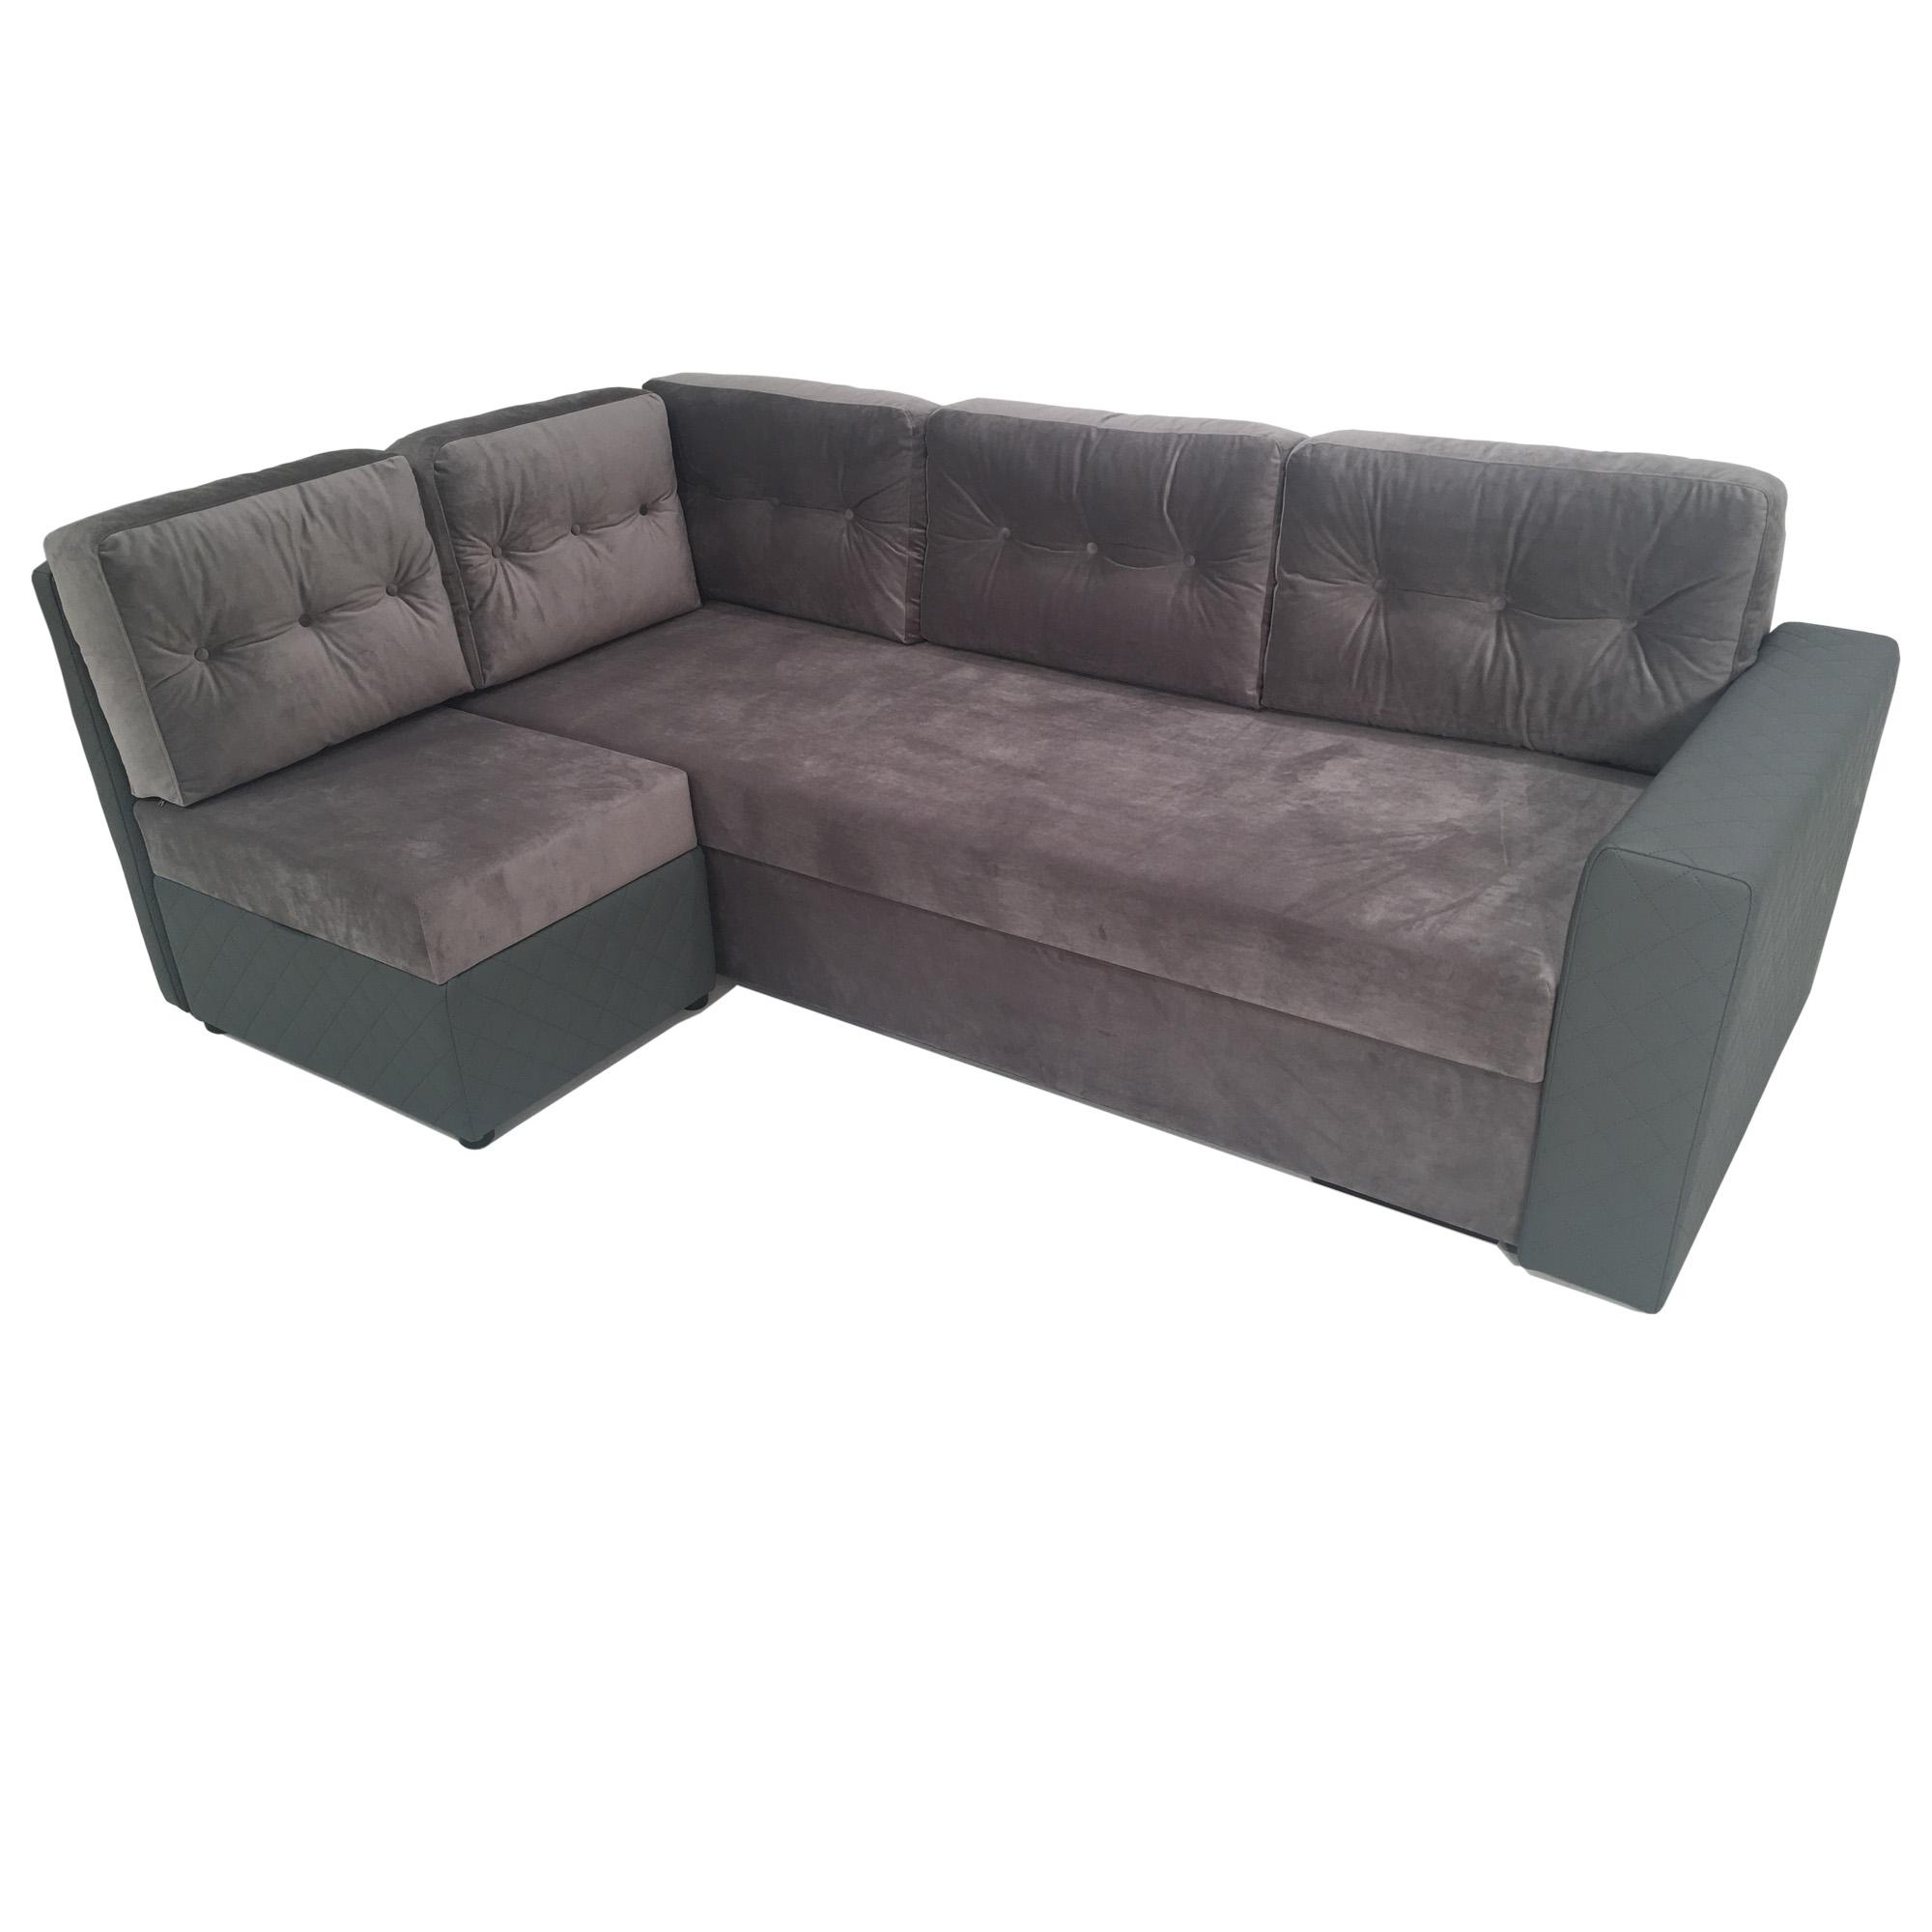 Amelija sofa-lova su pufu